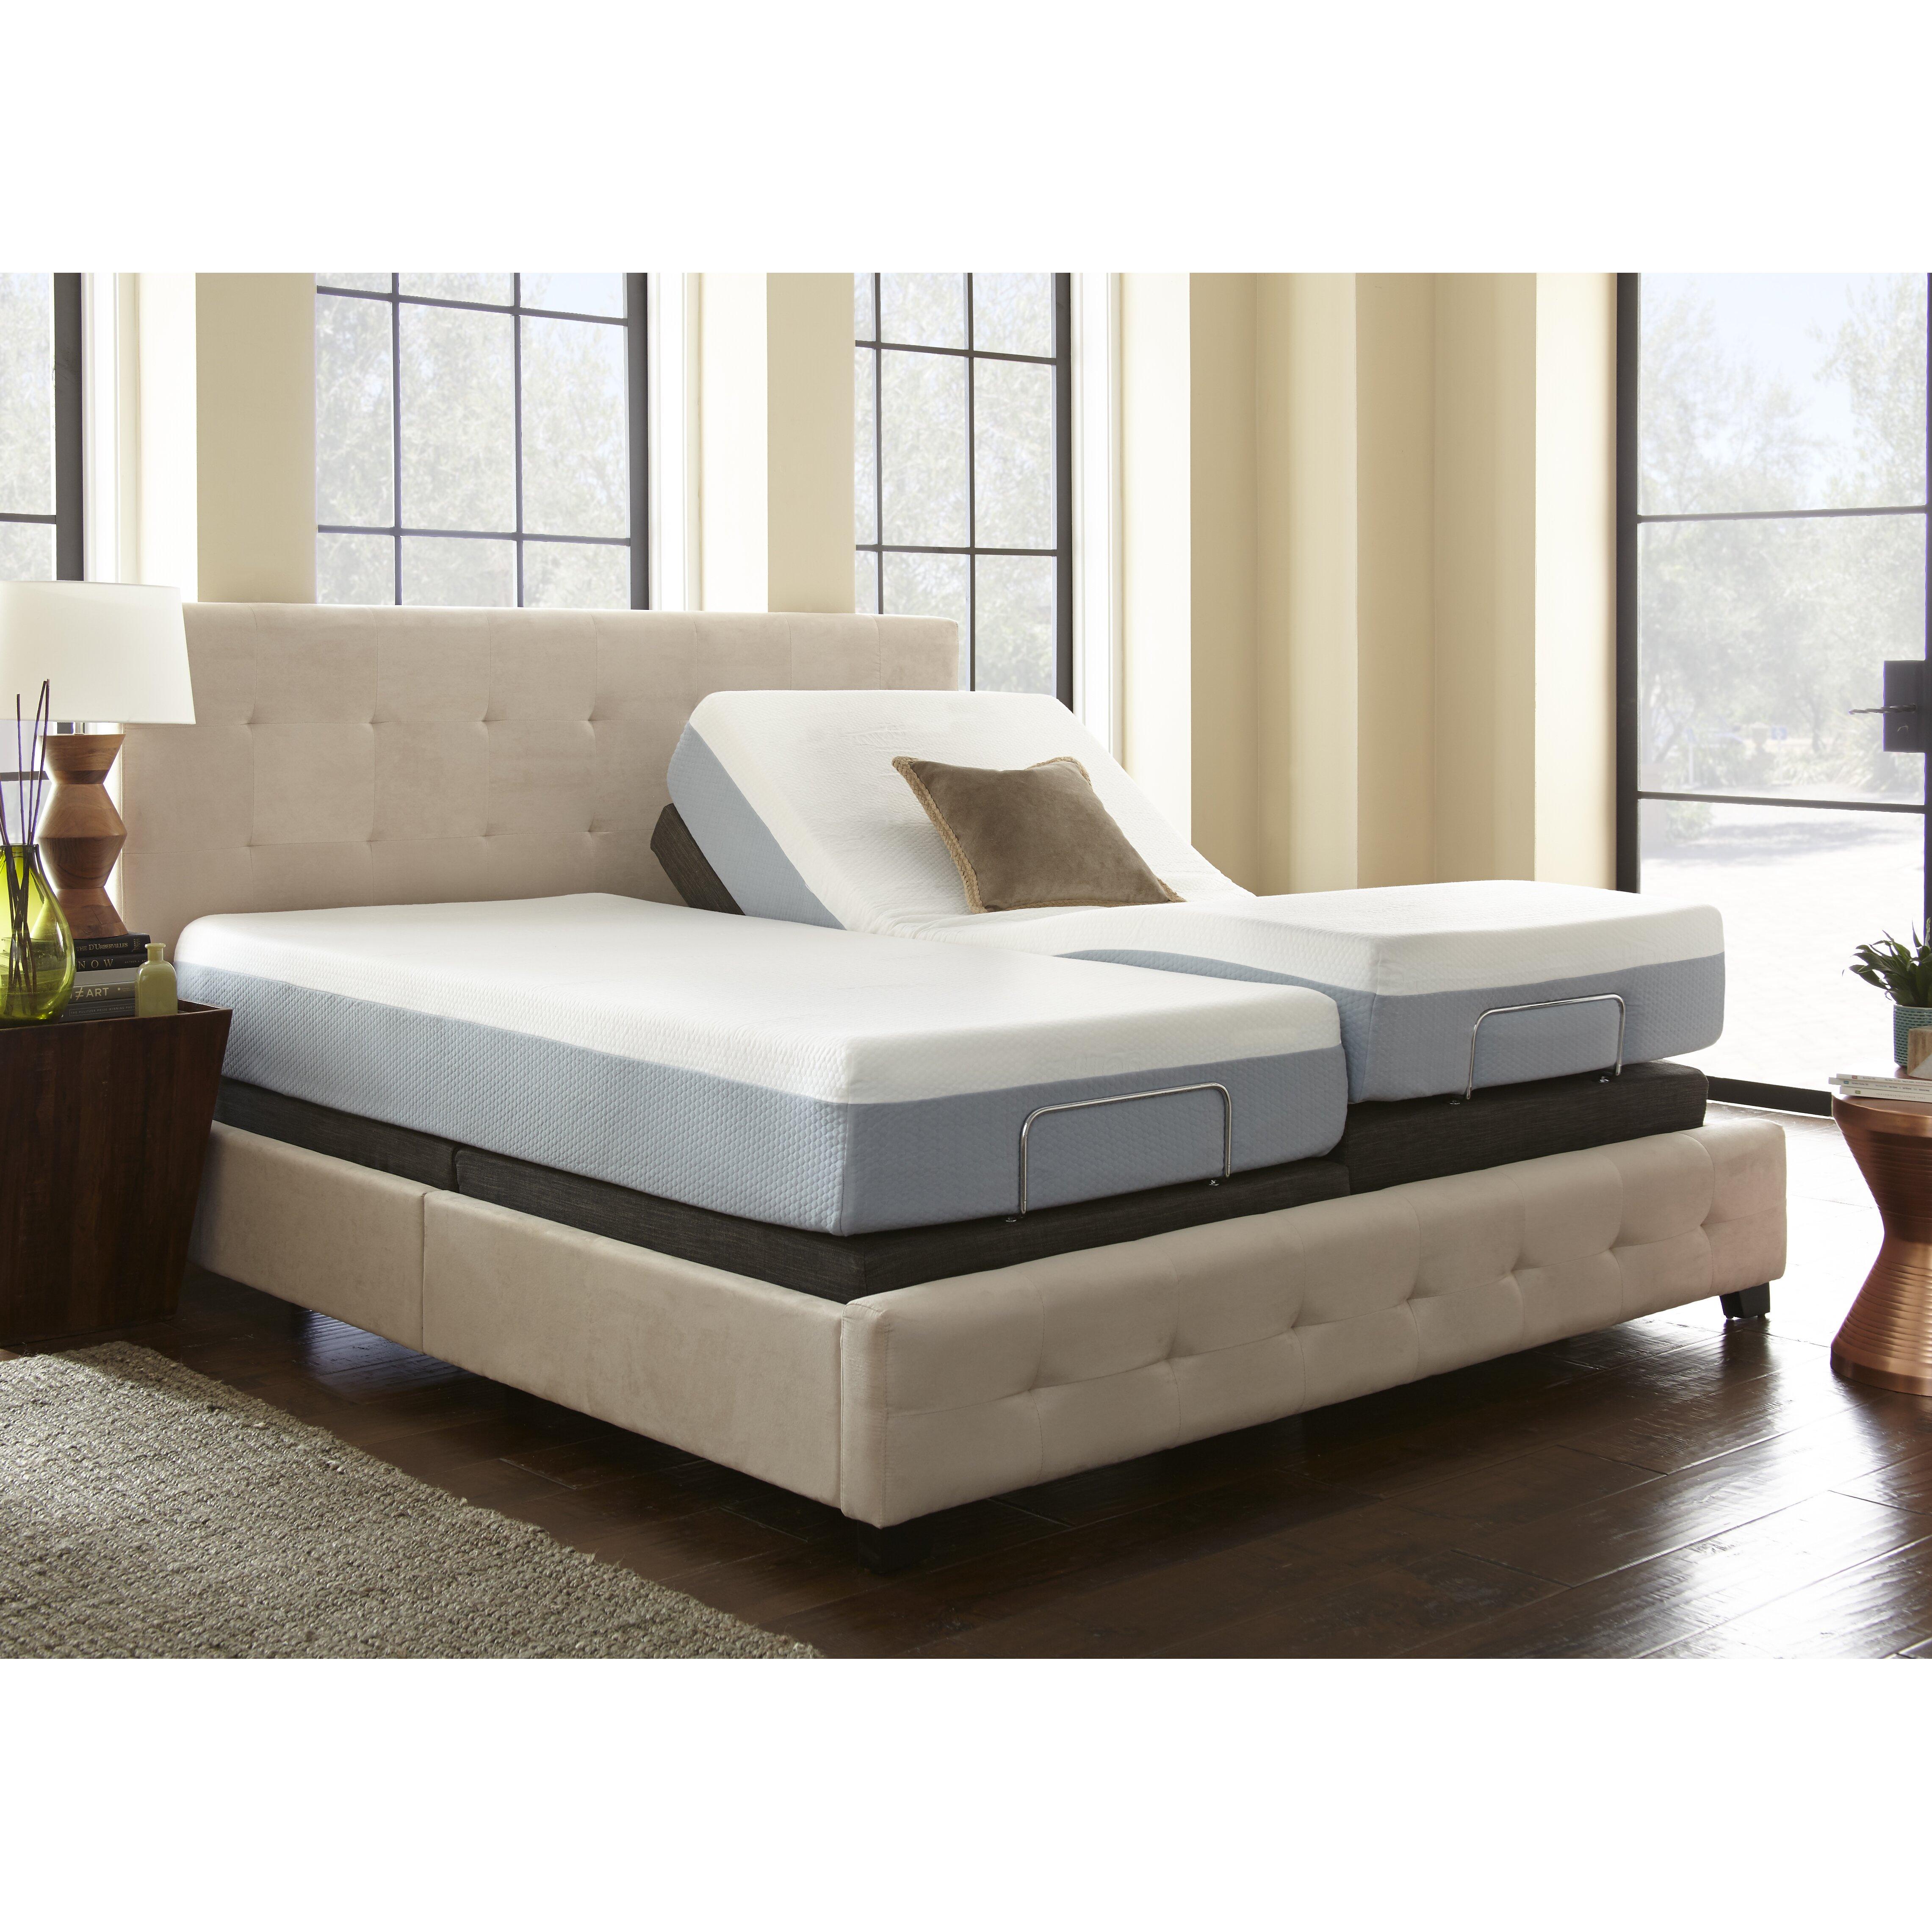 eco lux adjustable bed